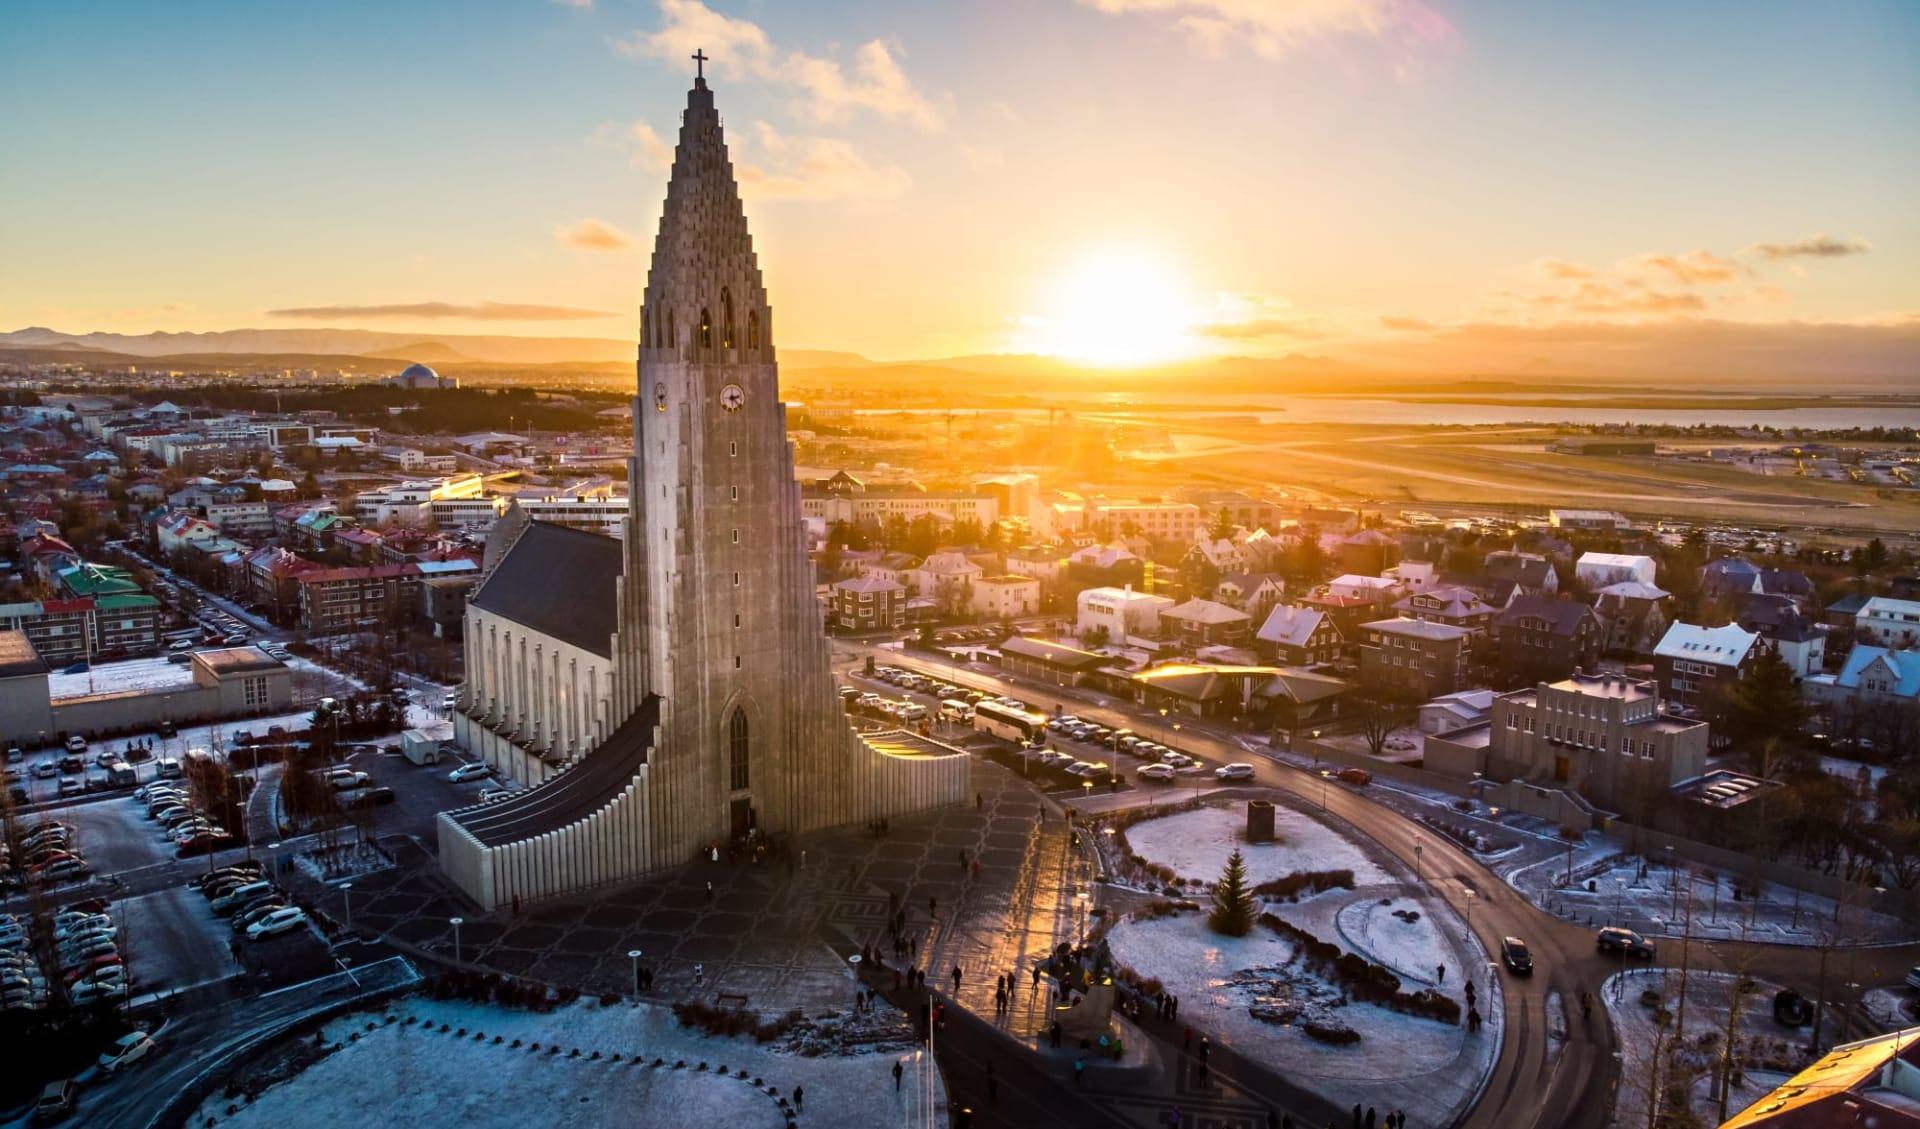 22 Hill in Reykjavik: Hallgrimskirkja Kirche und Reykjavik Stadtbild in Island